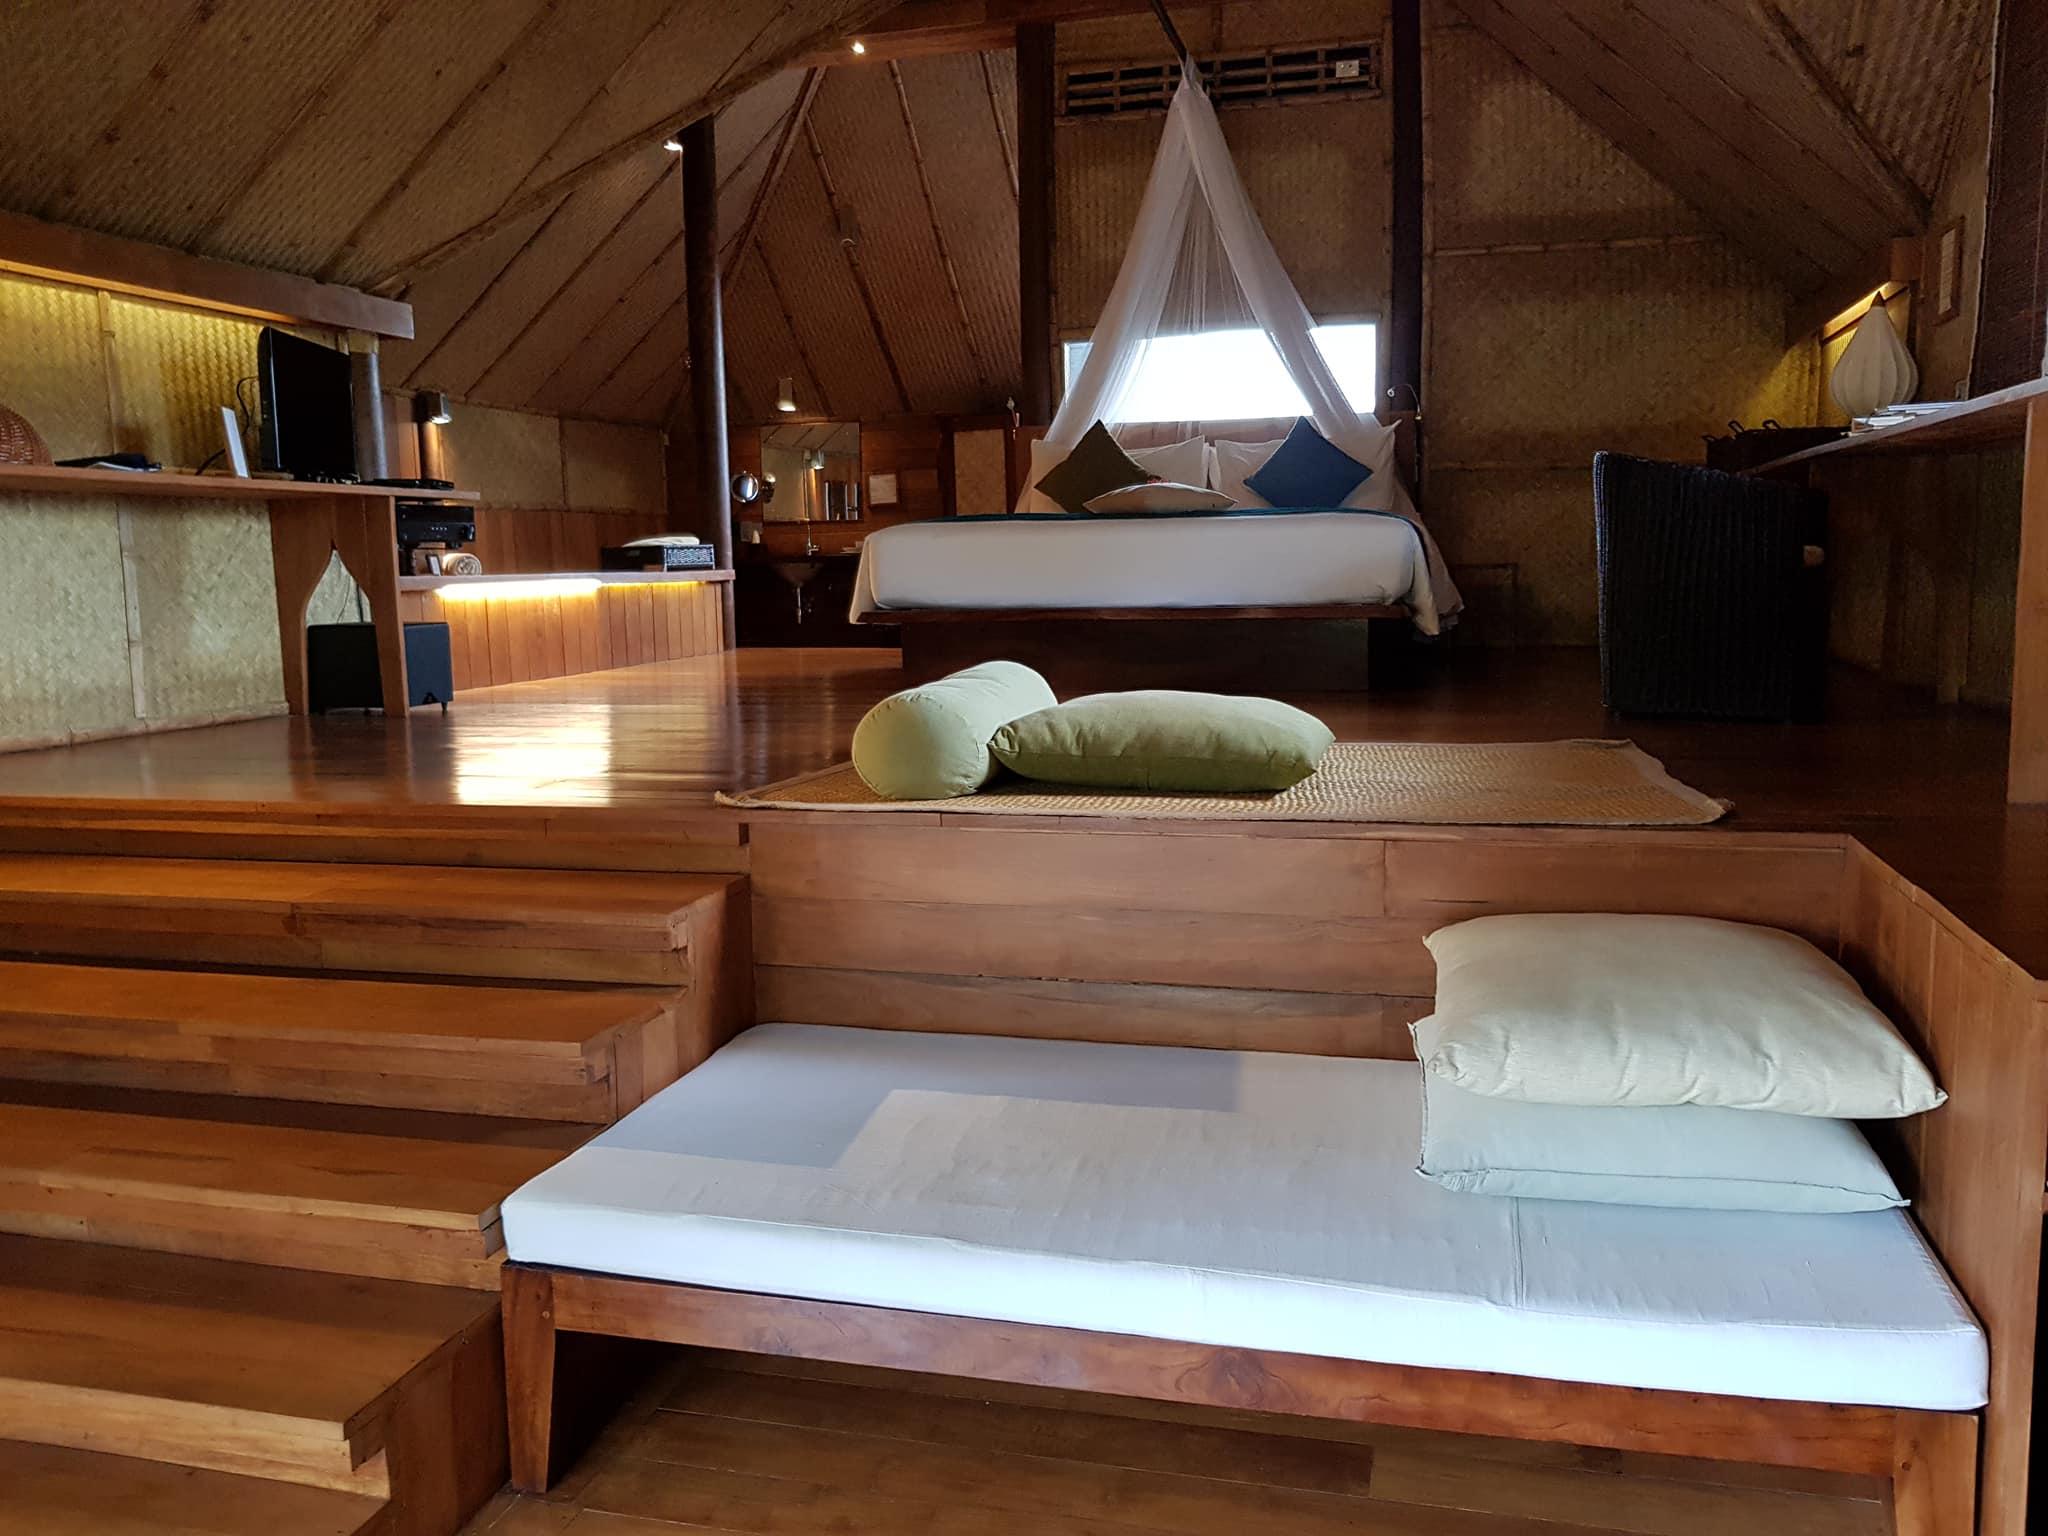 invite-to-paradise-sri-lanka-maldives-holiday-honeymoon-specialists-customer-guest-feedback-zane-lisa-butcher-jetwing-vil-uyana-hotel-sigiriya-cultural-triangle-room-seating.jpg